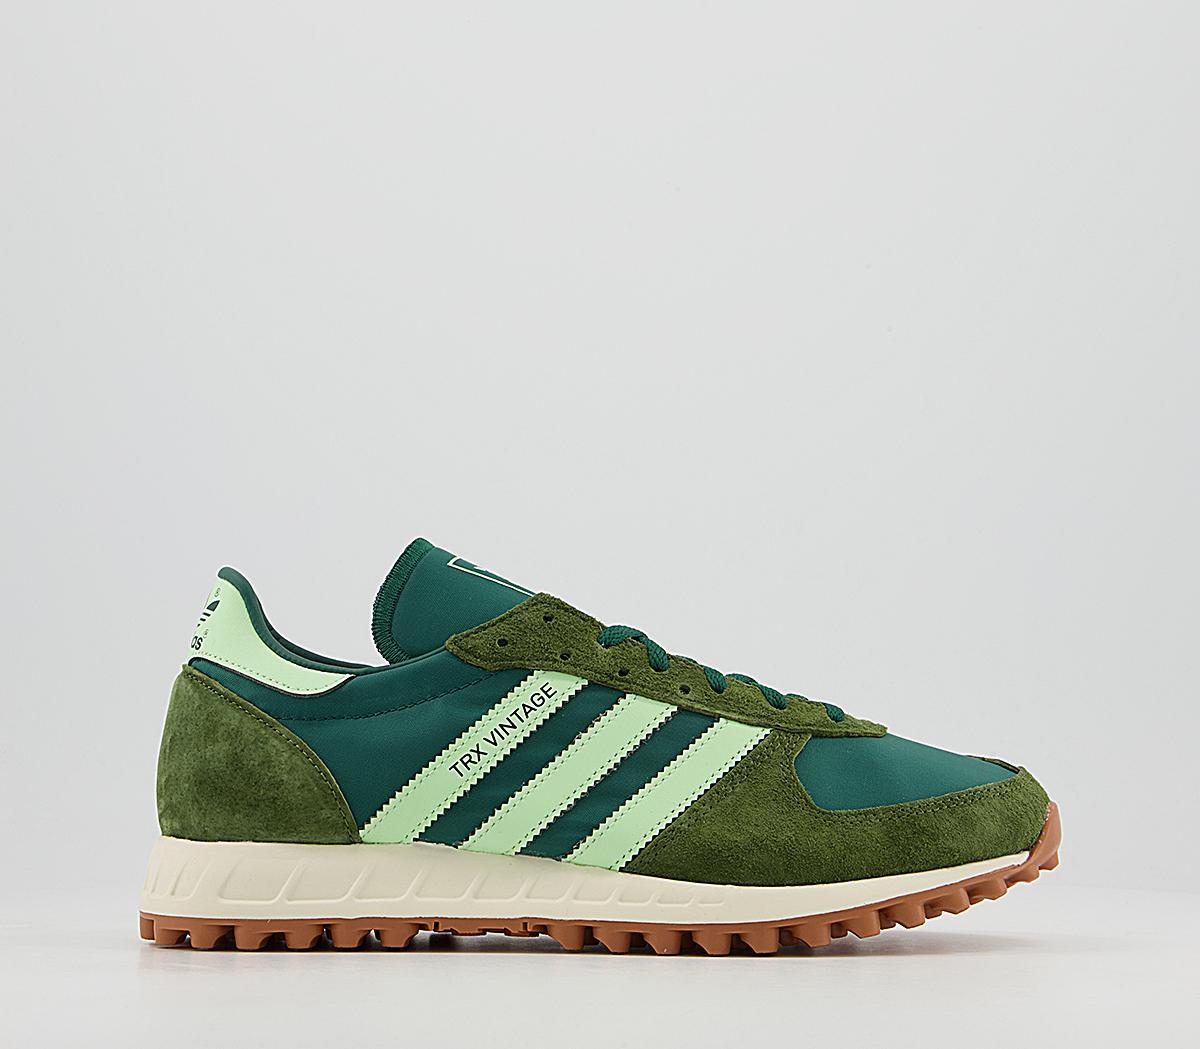 Trx Vintage Trainers